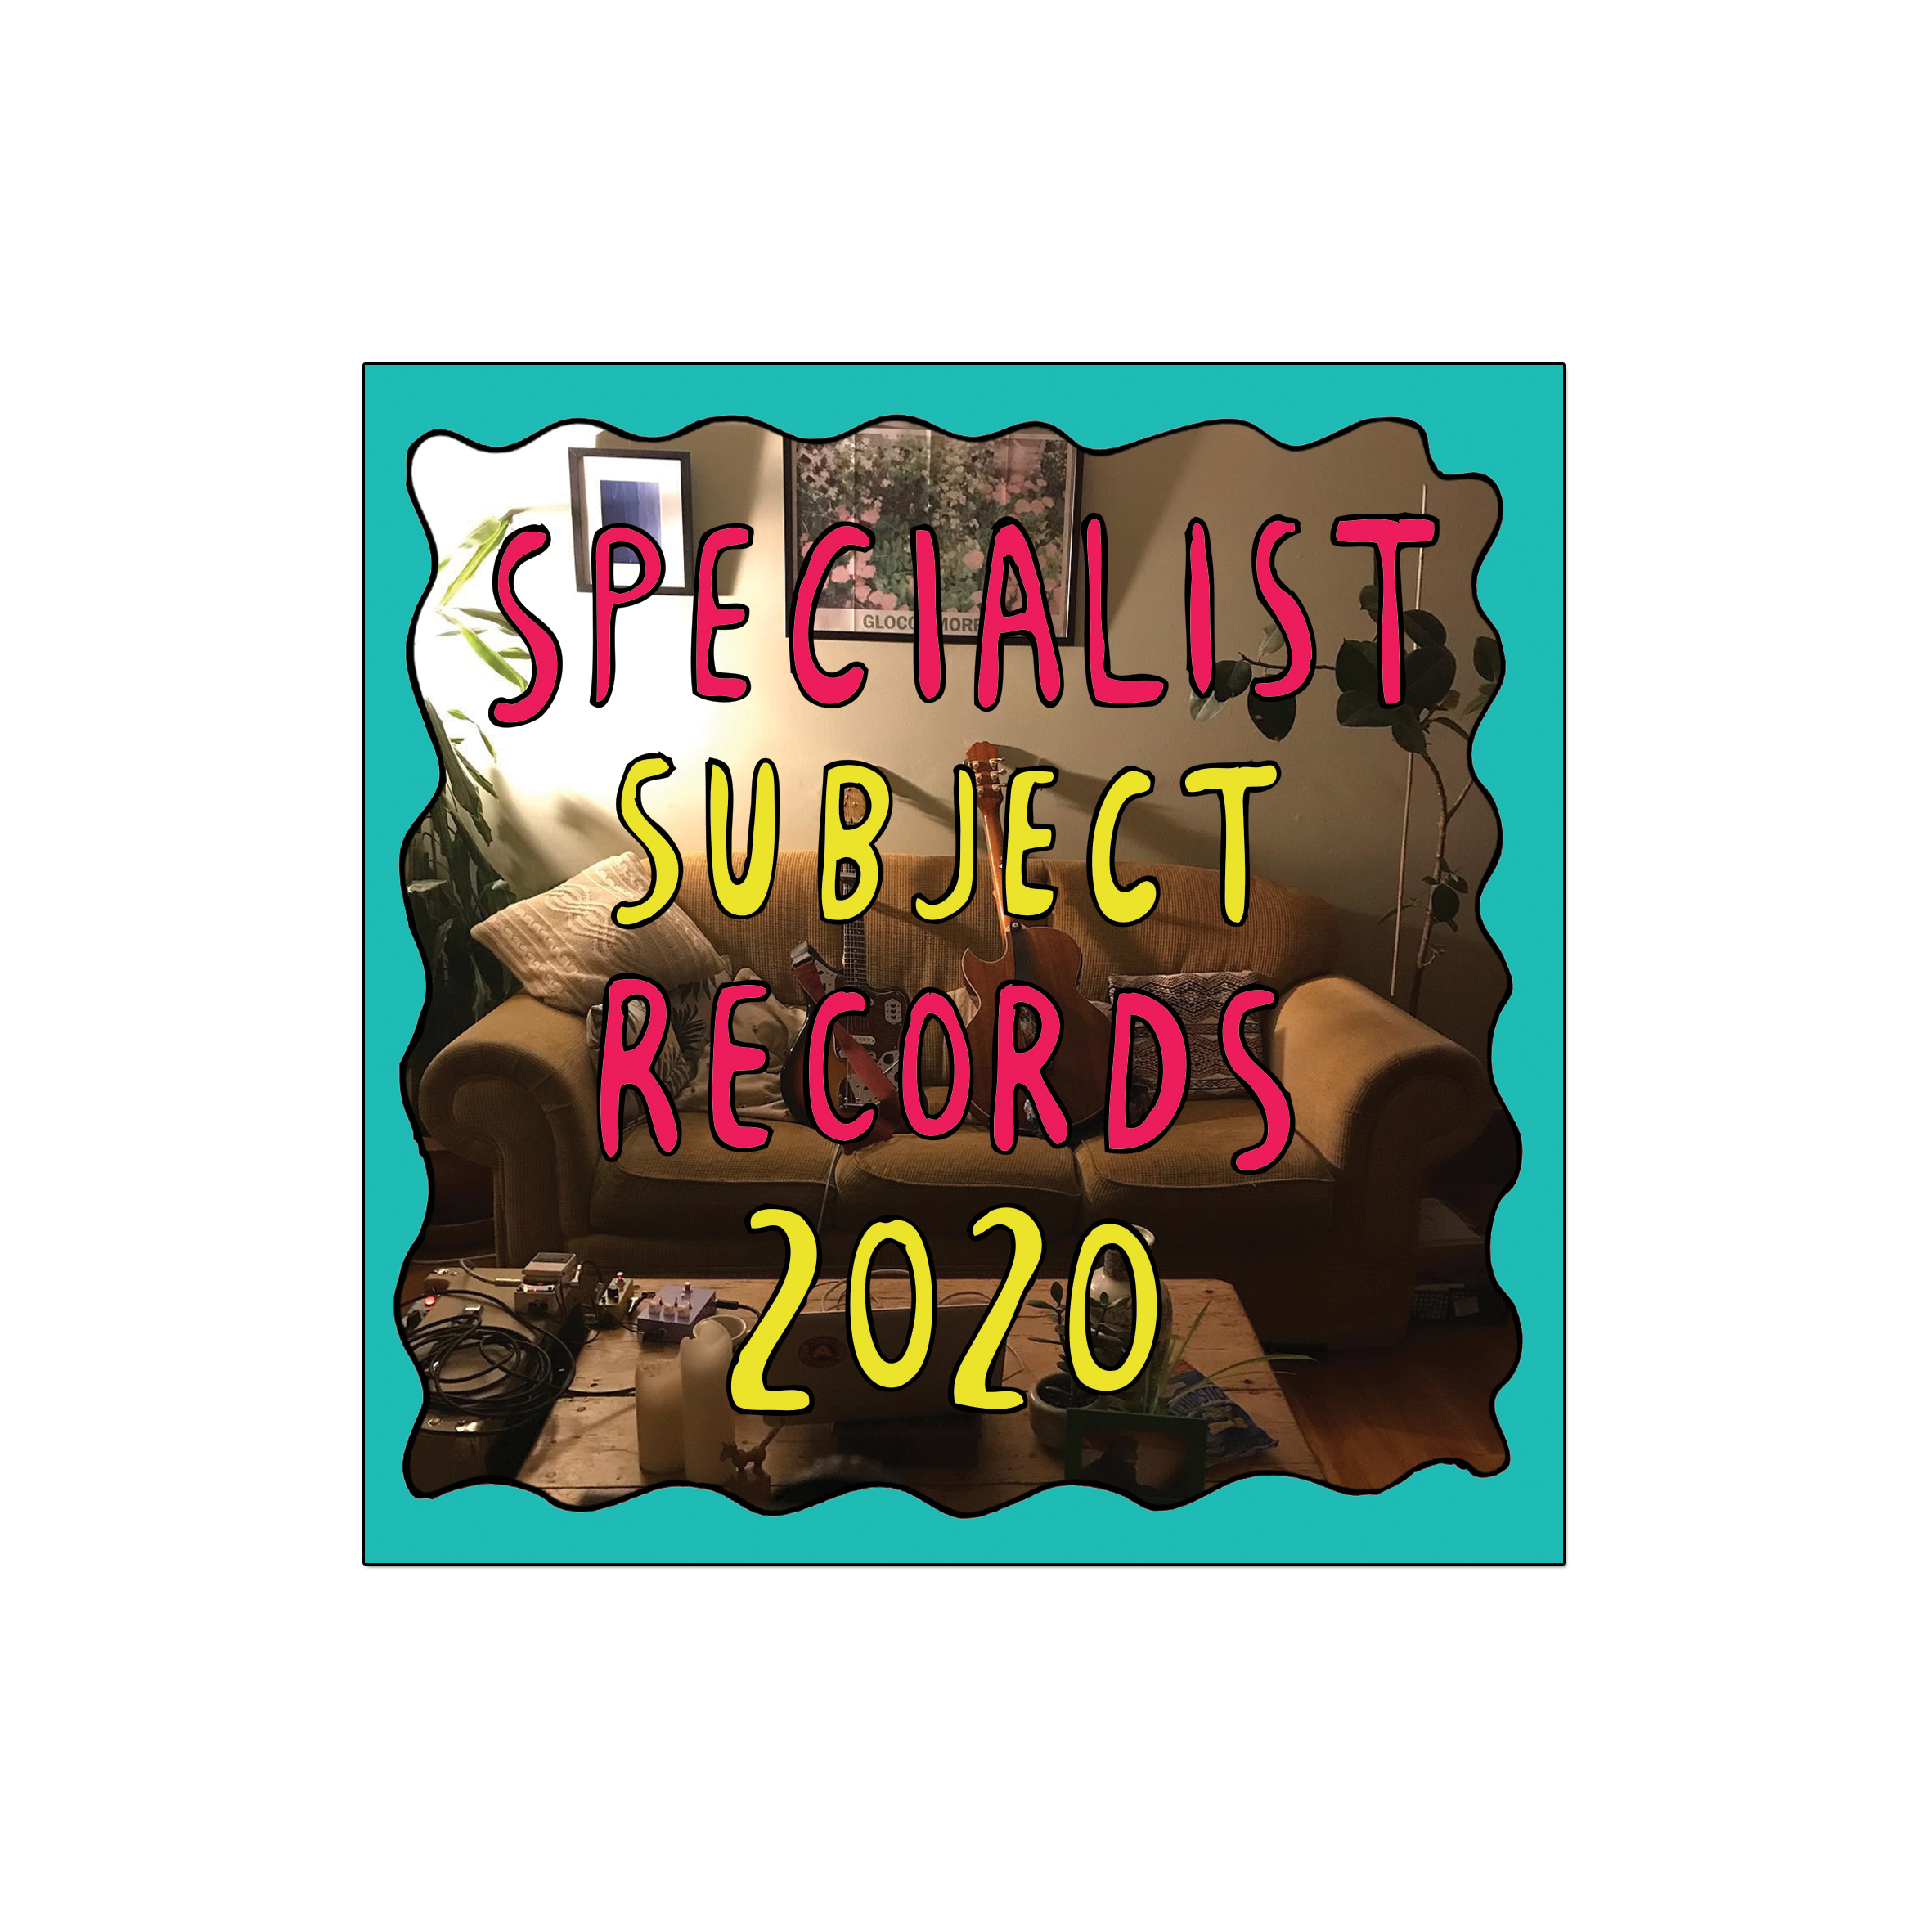 2021 Digital Season Ticket